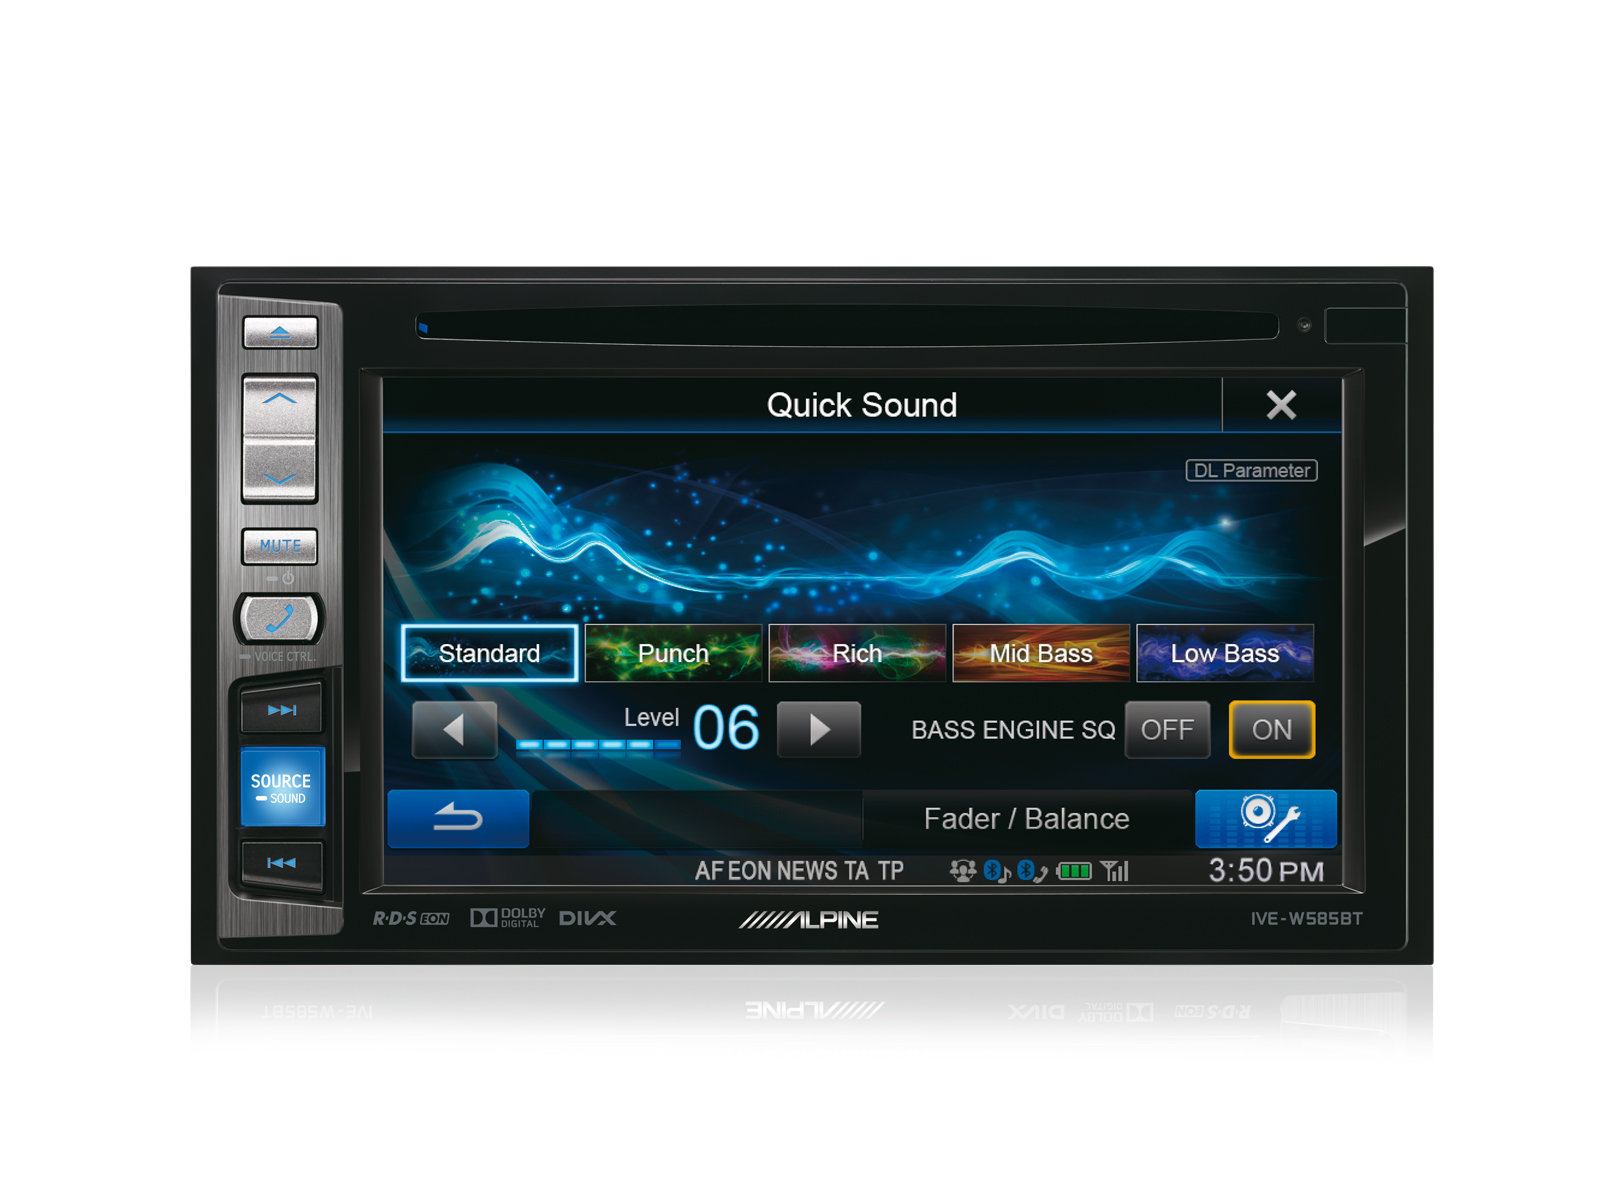 "Alpine IVE W585BT 6.1"" Radio CD/DVD/DIVX/MP3 Double Din Stereo Bluetooth NEW"